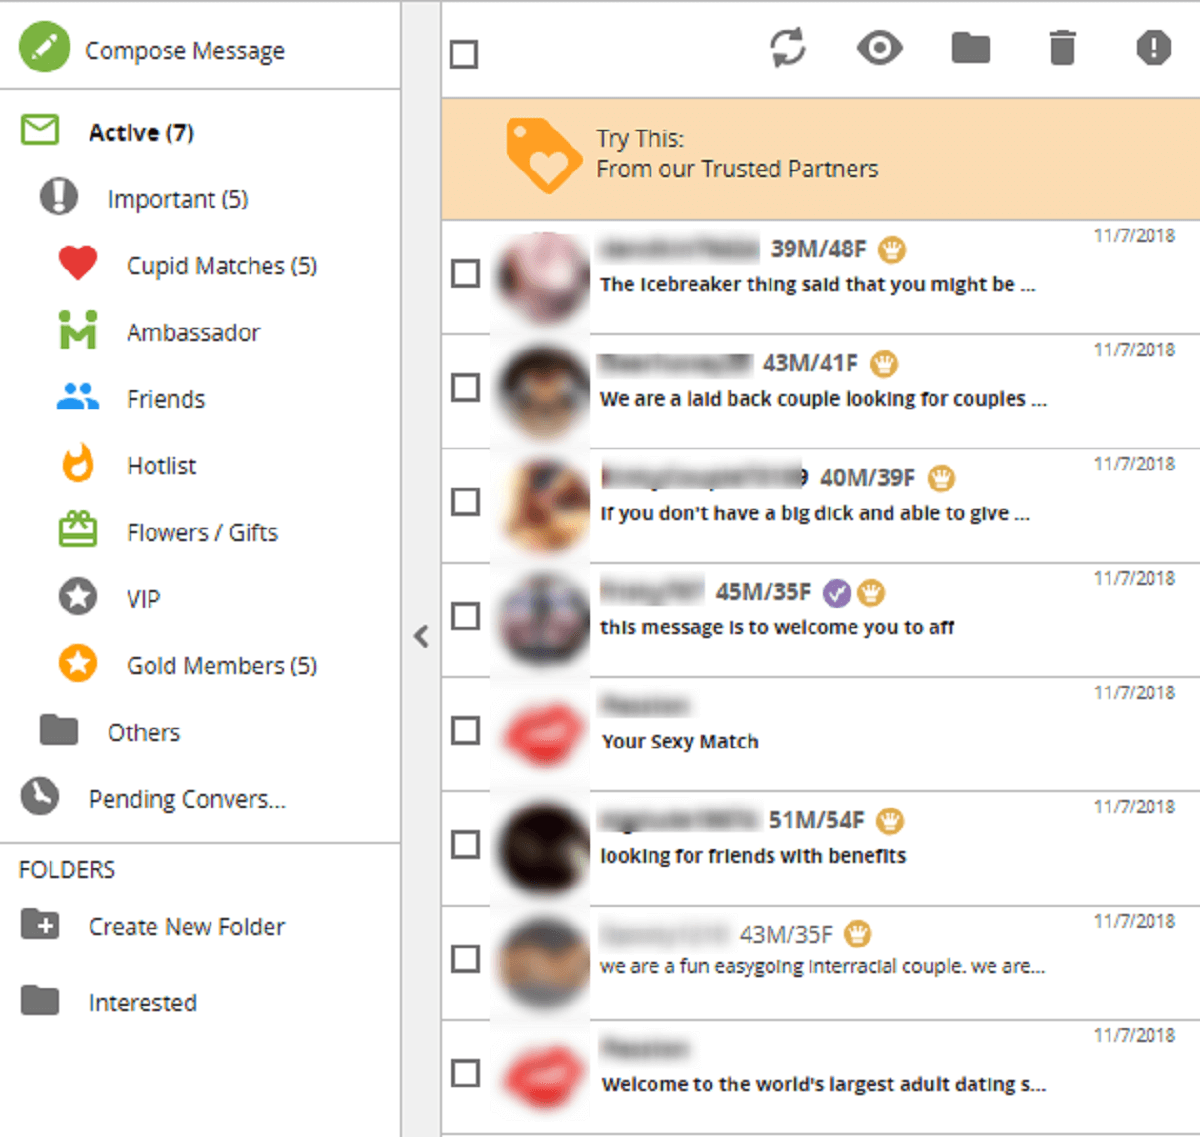 Passion.com Inbox